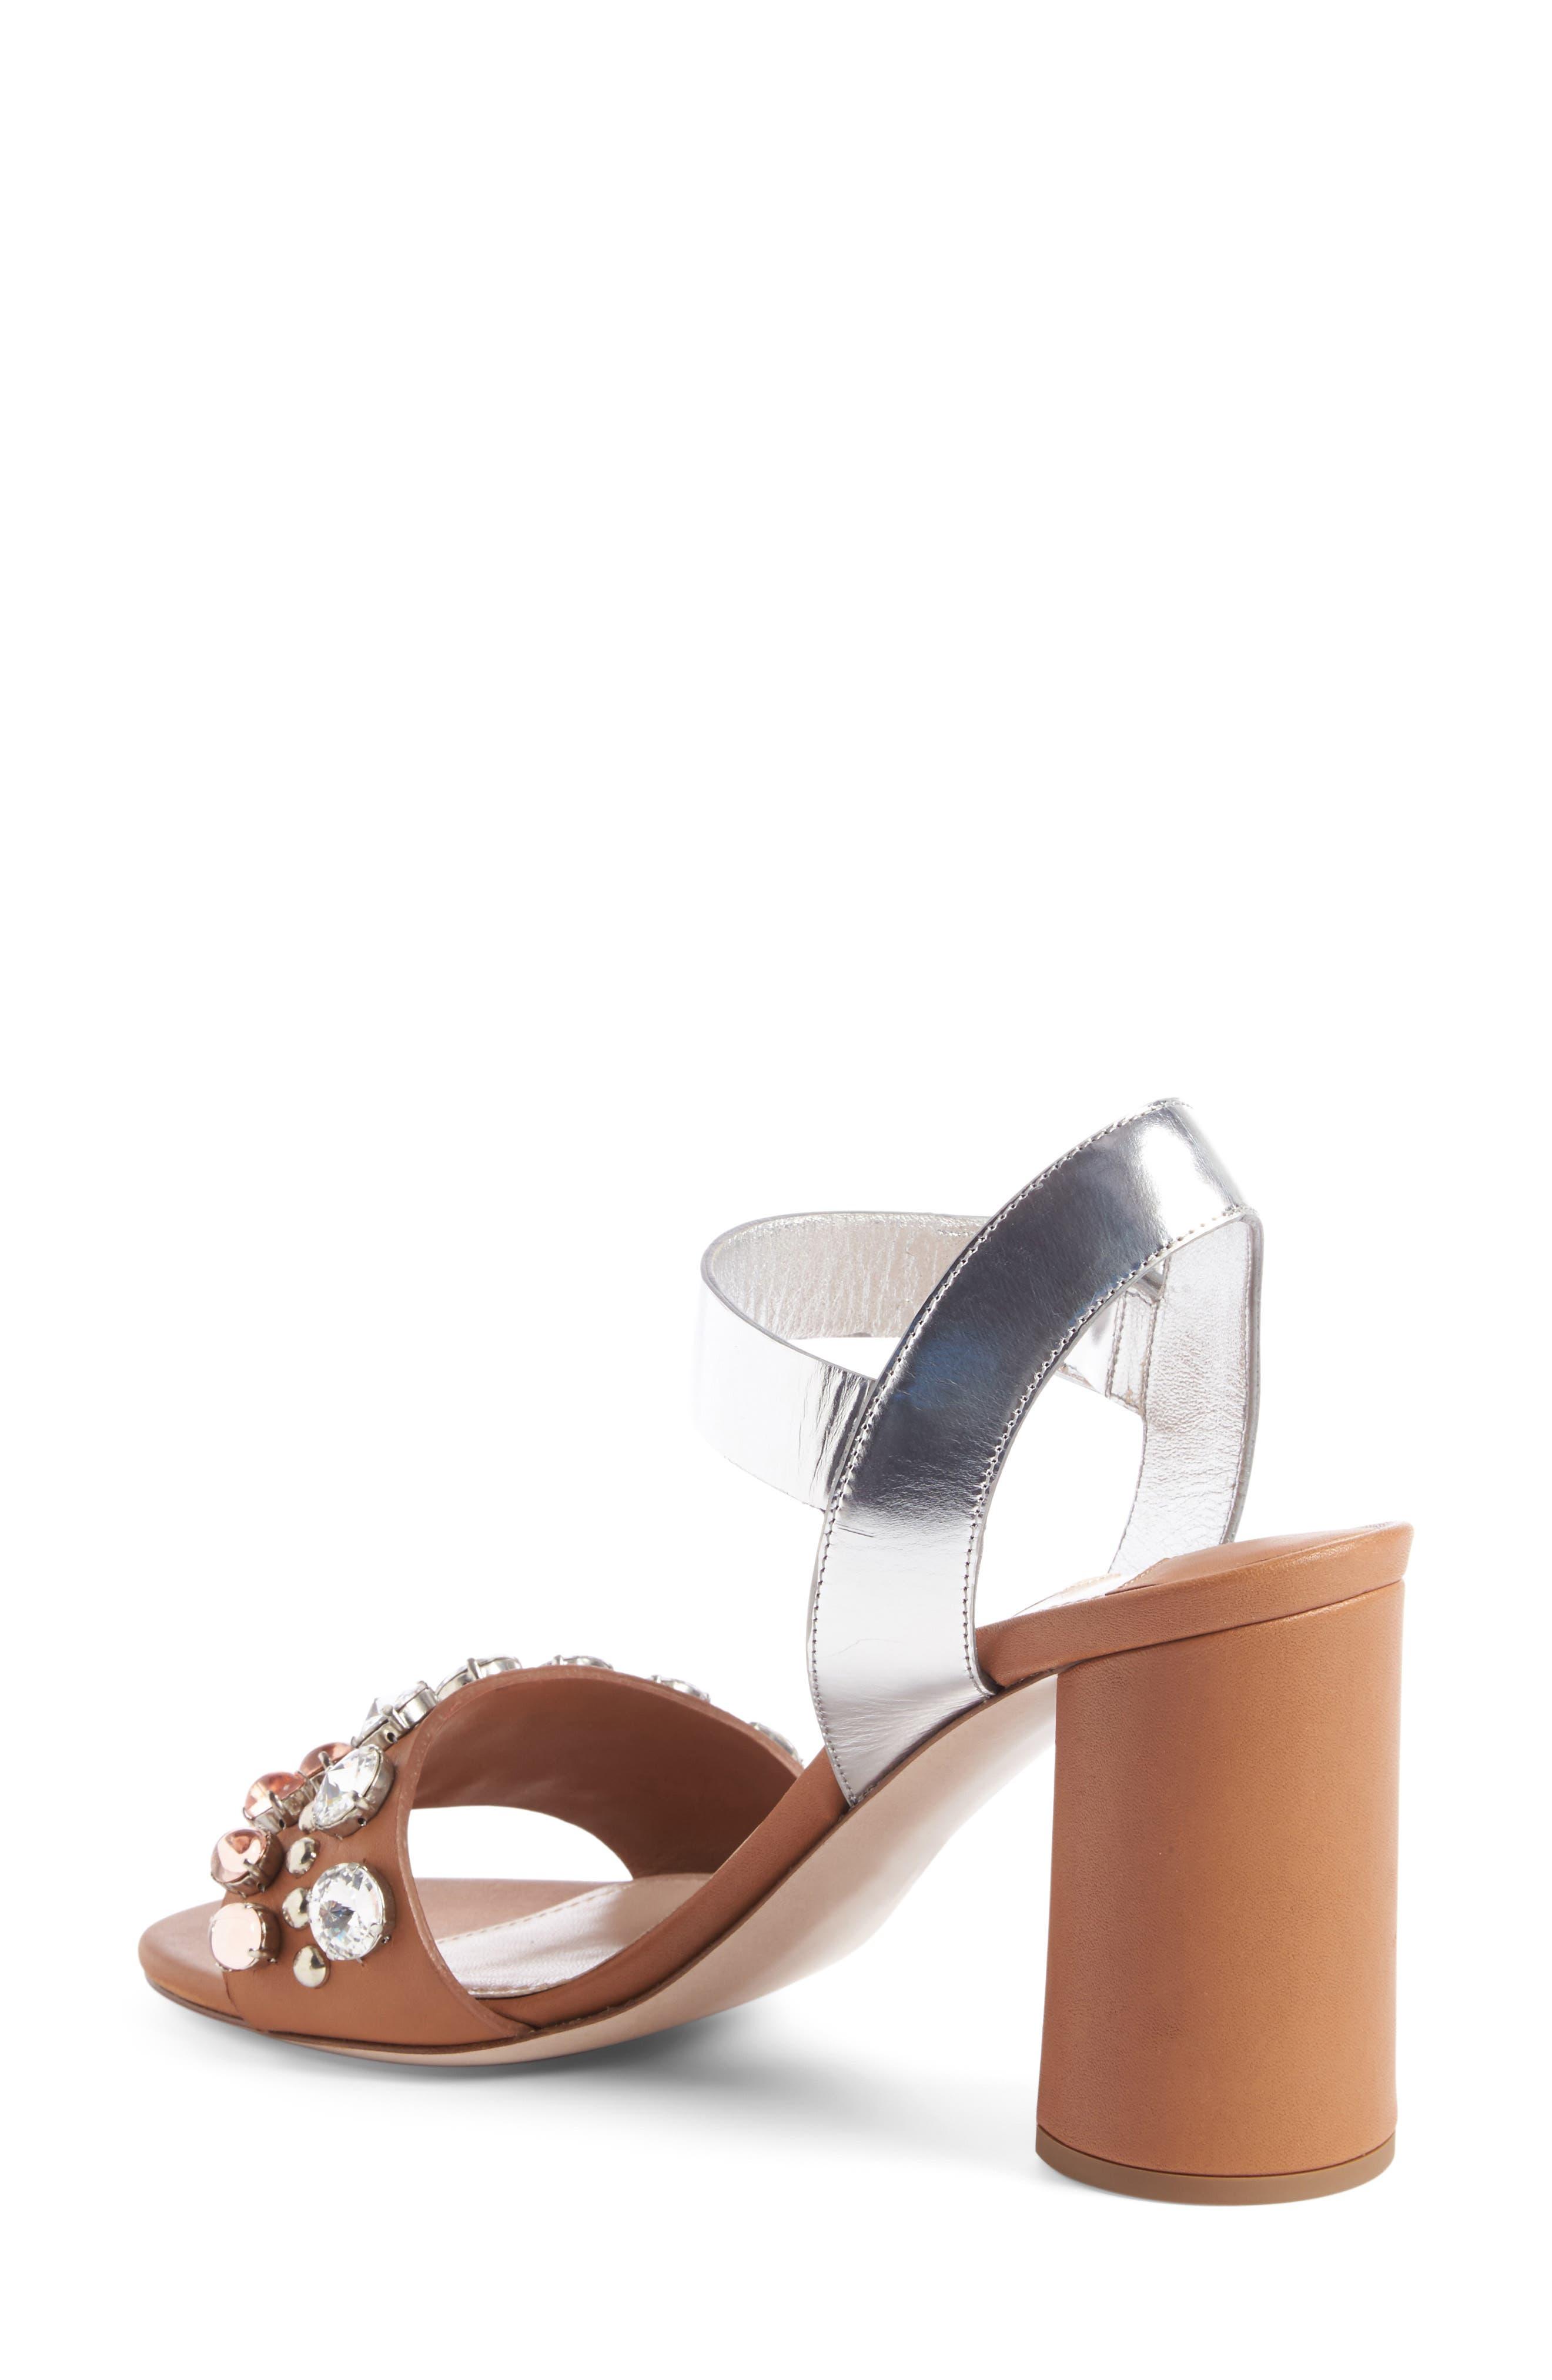 MIU MIU, Jewel Sandal, Main thumbnail 1, color, 200